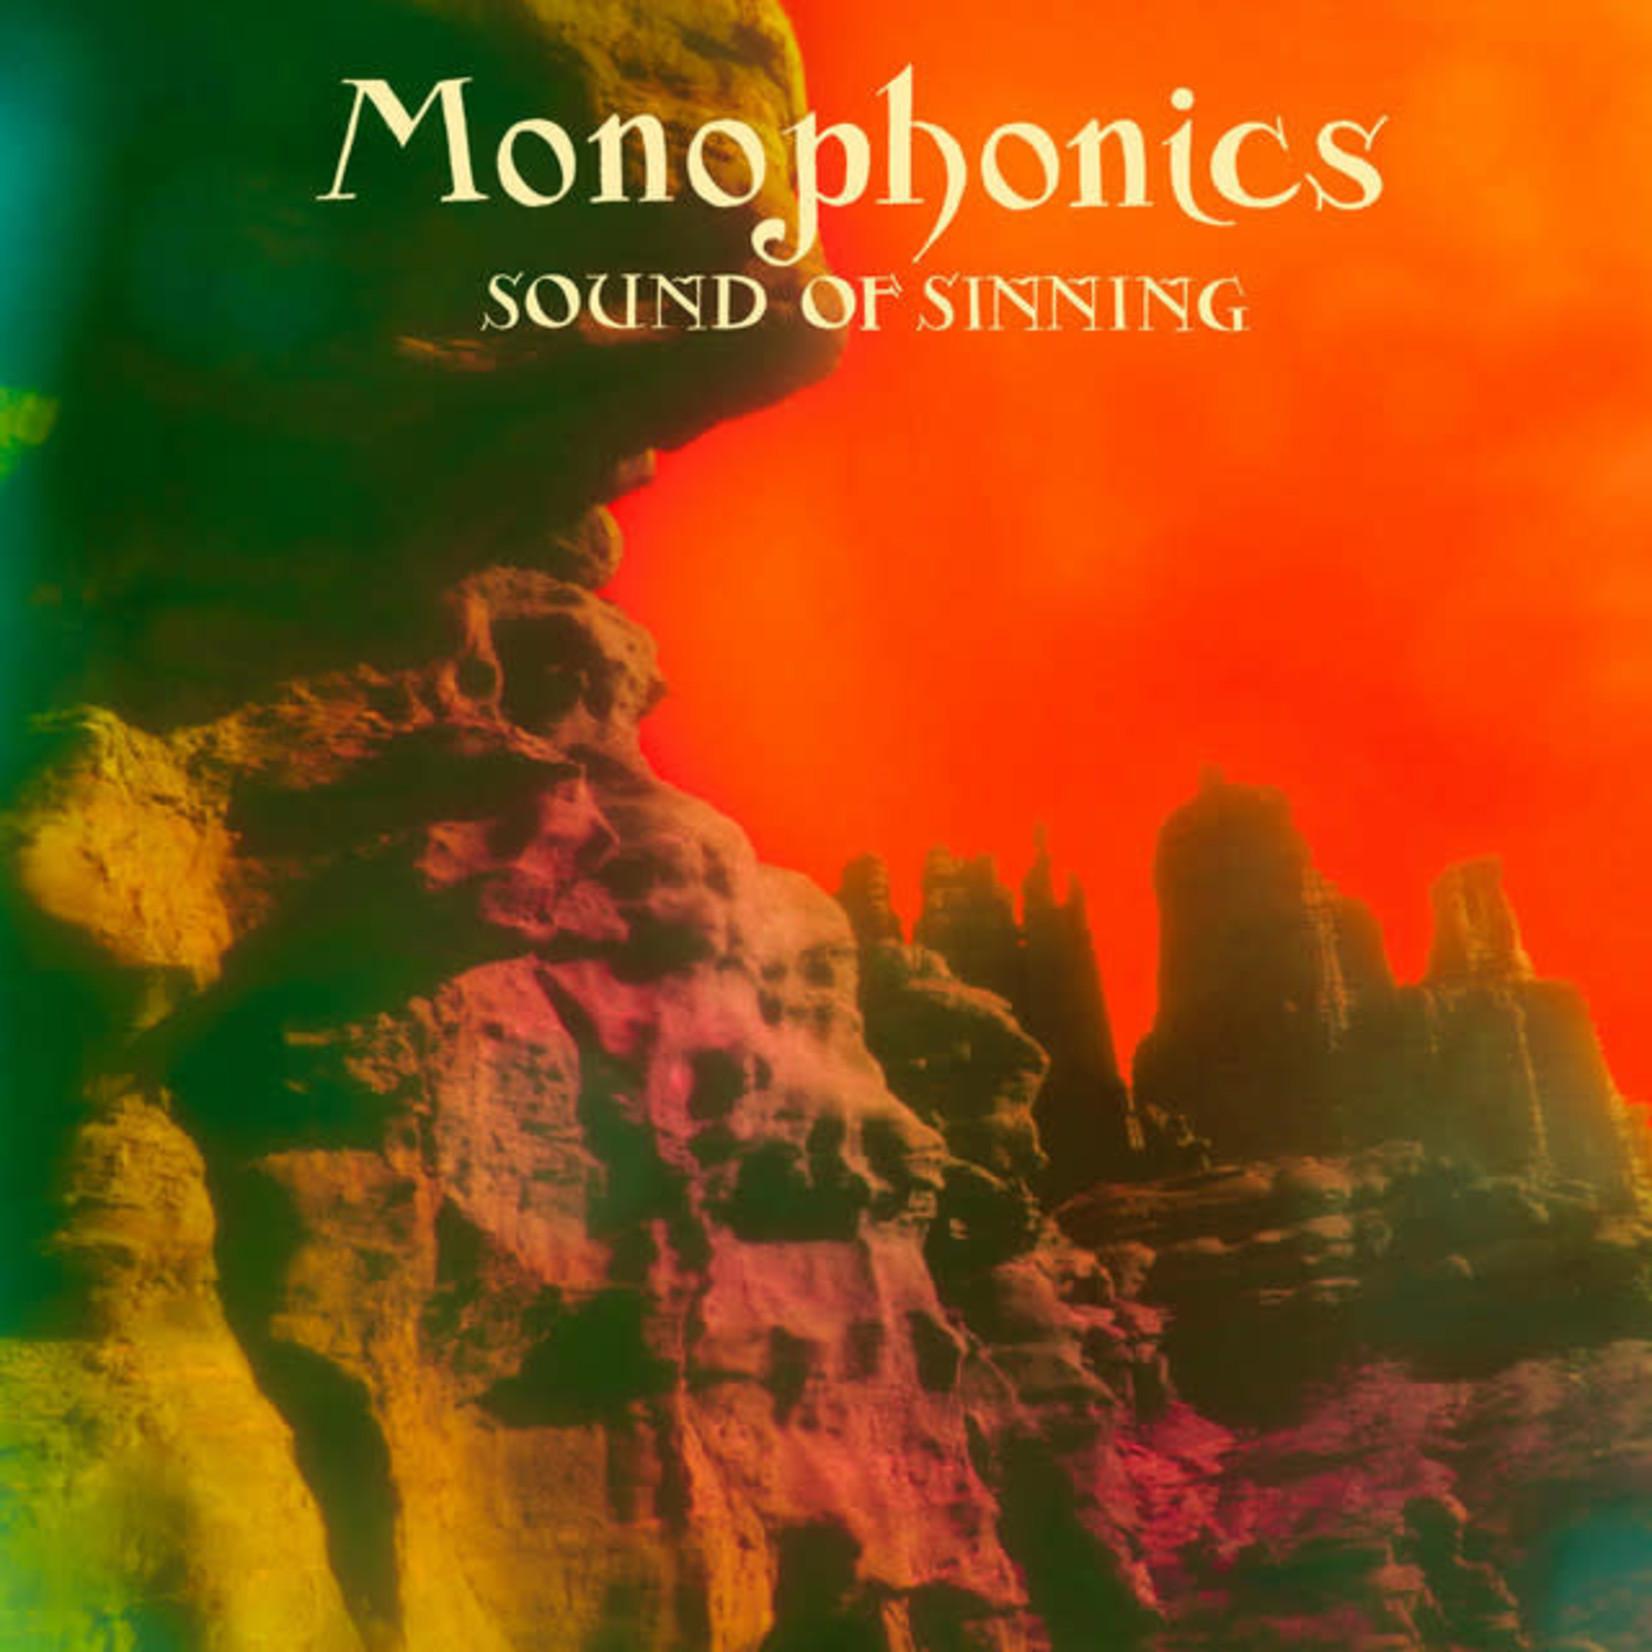 Vinyl Monophonics - Sound Of Sinning